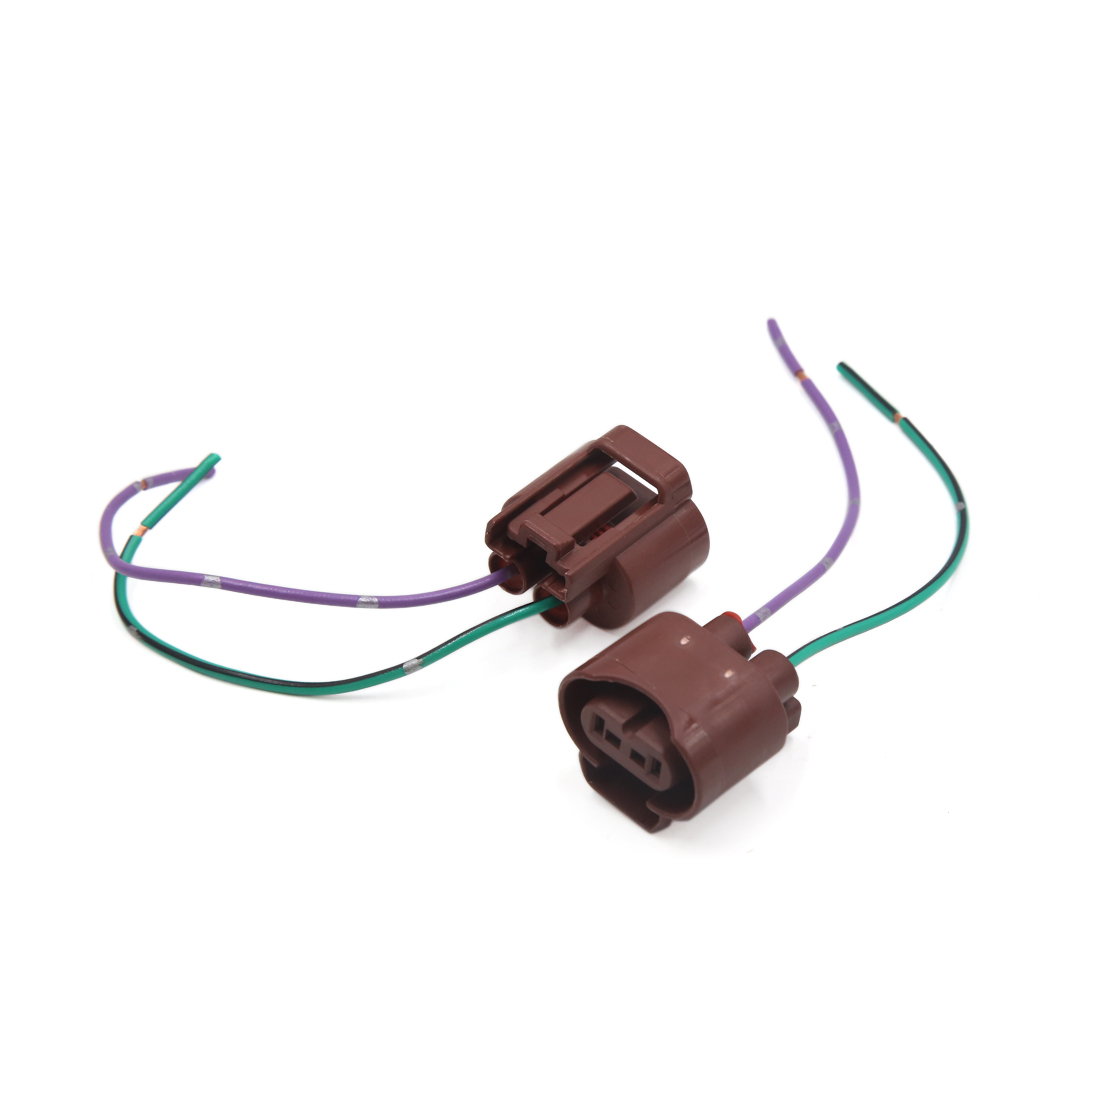 medium resolution of 2pcs 9006 foglight lamp bulb extension wire harness socket connector